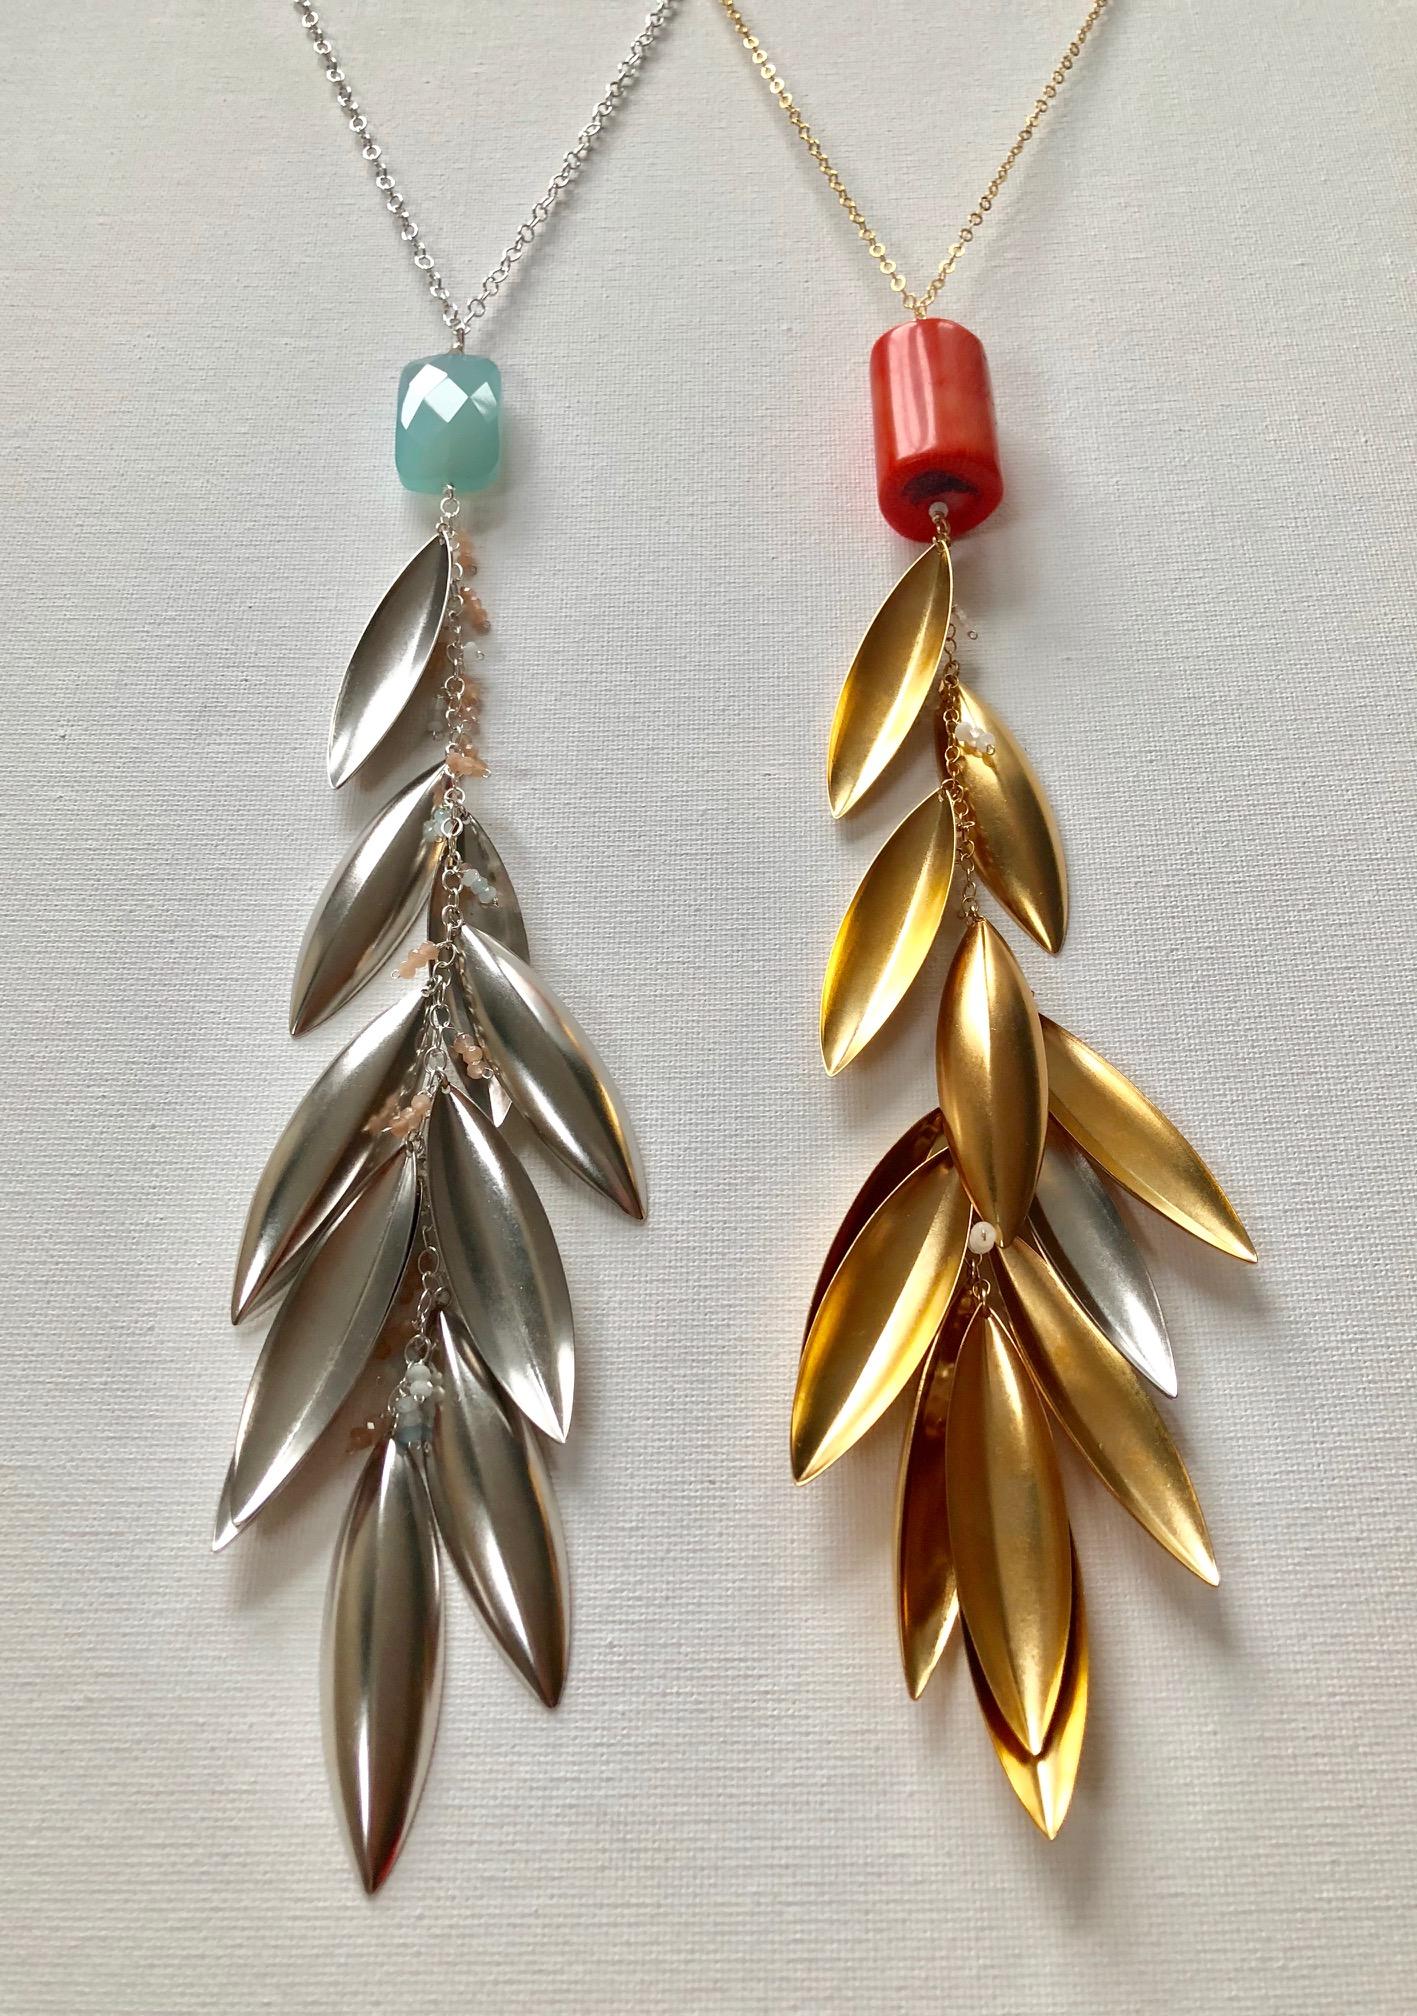 Shop Online falk jewelry designs